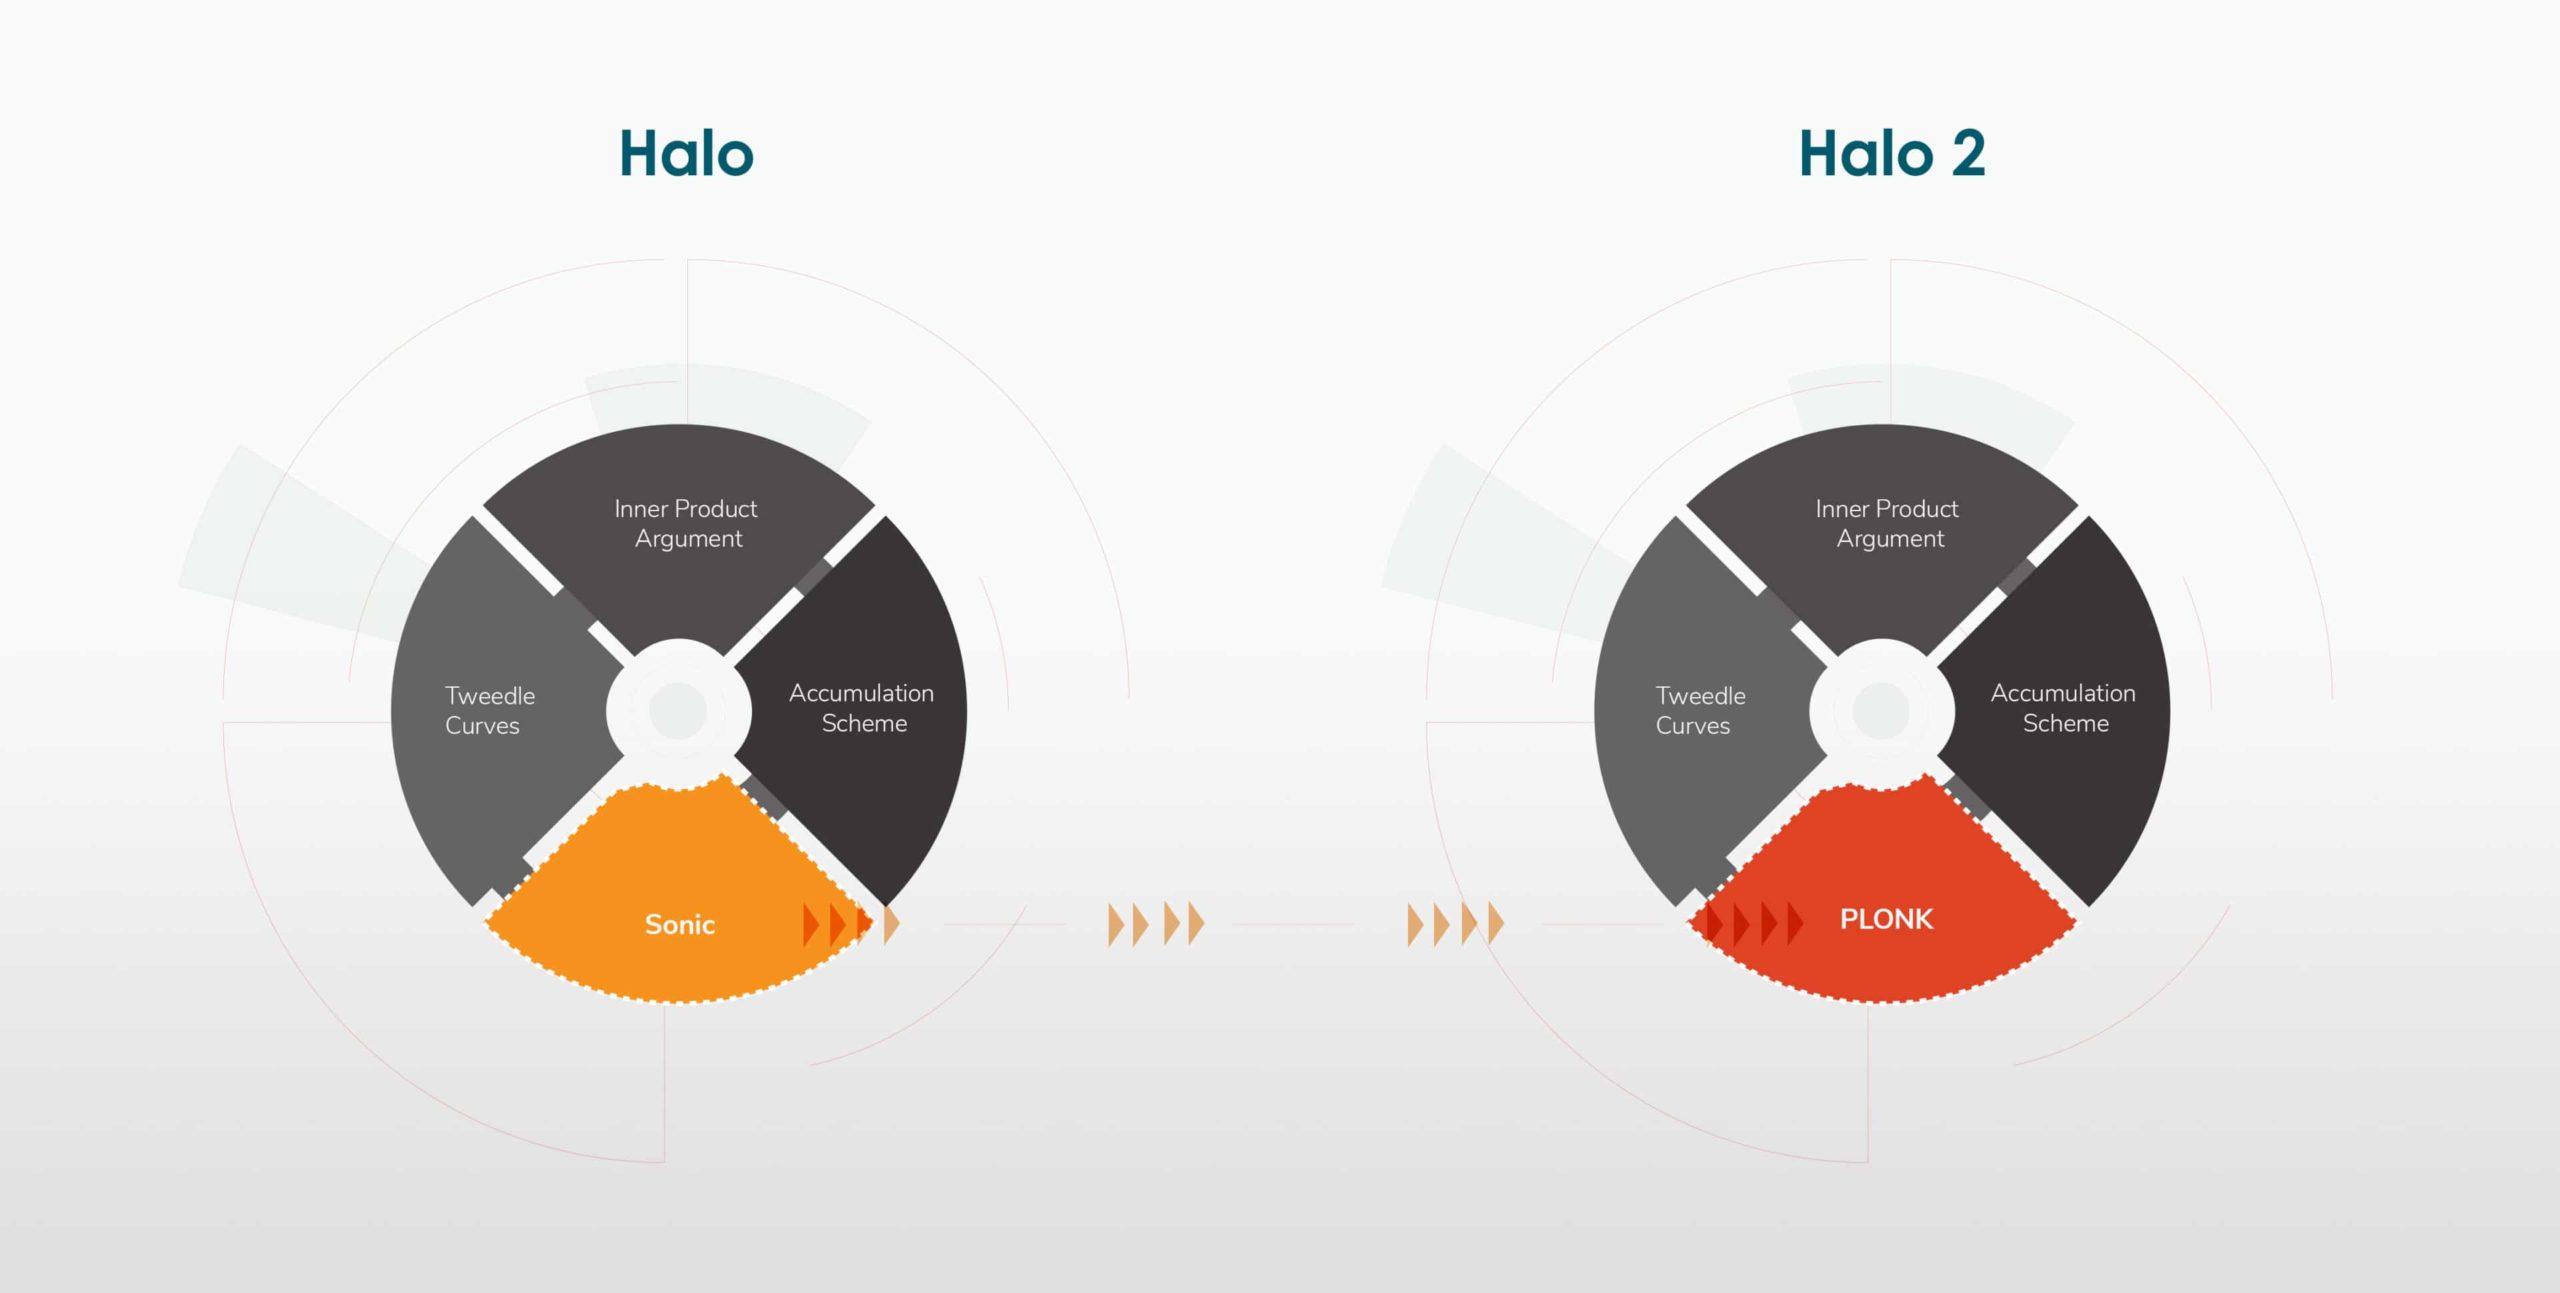 Zcash Halo 2